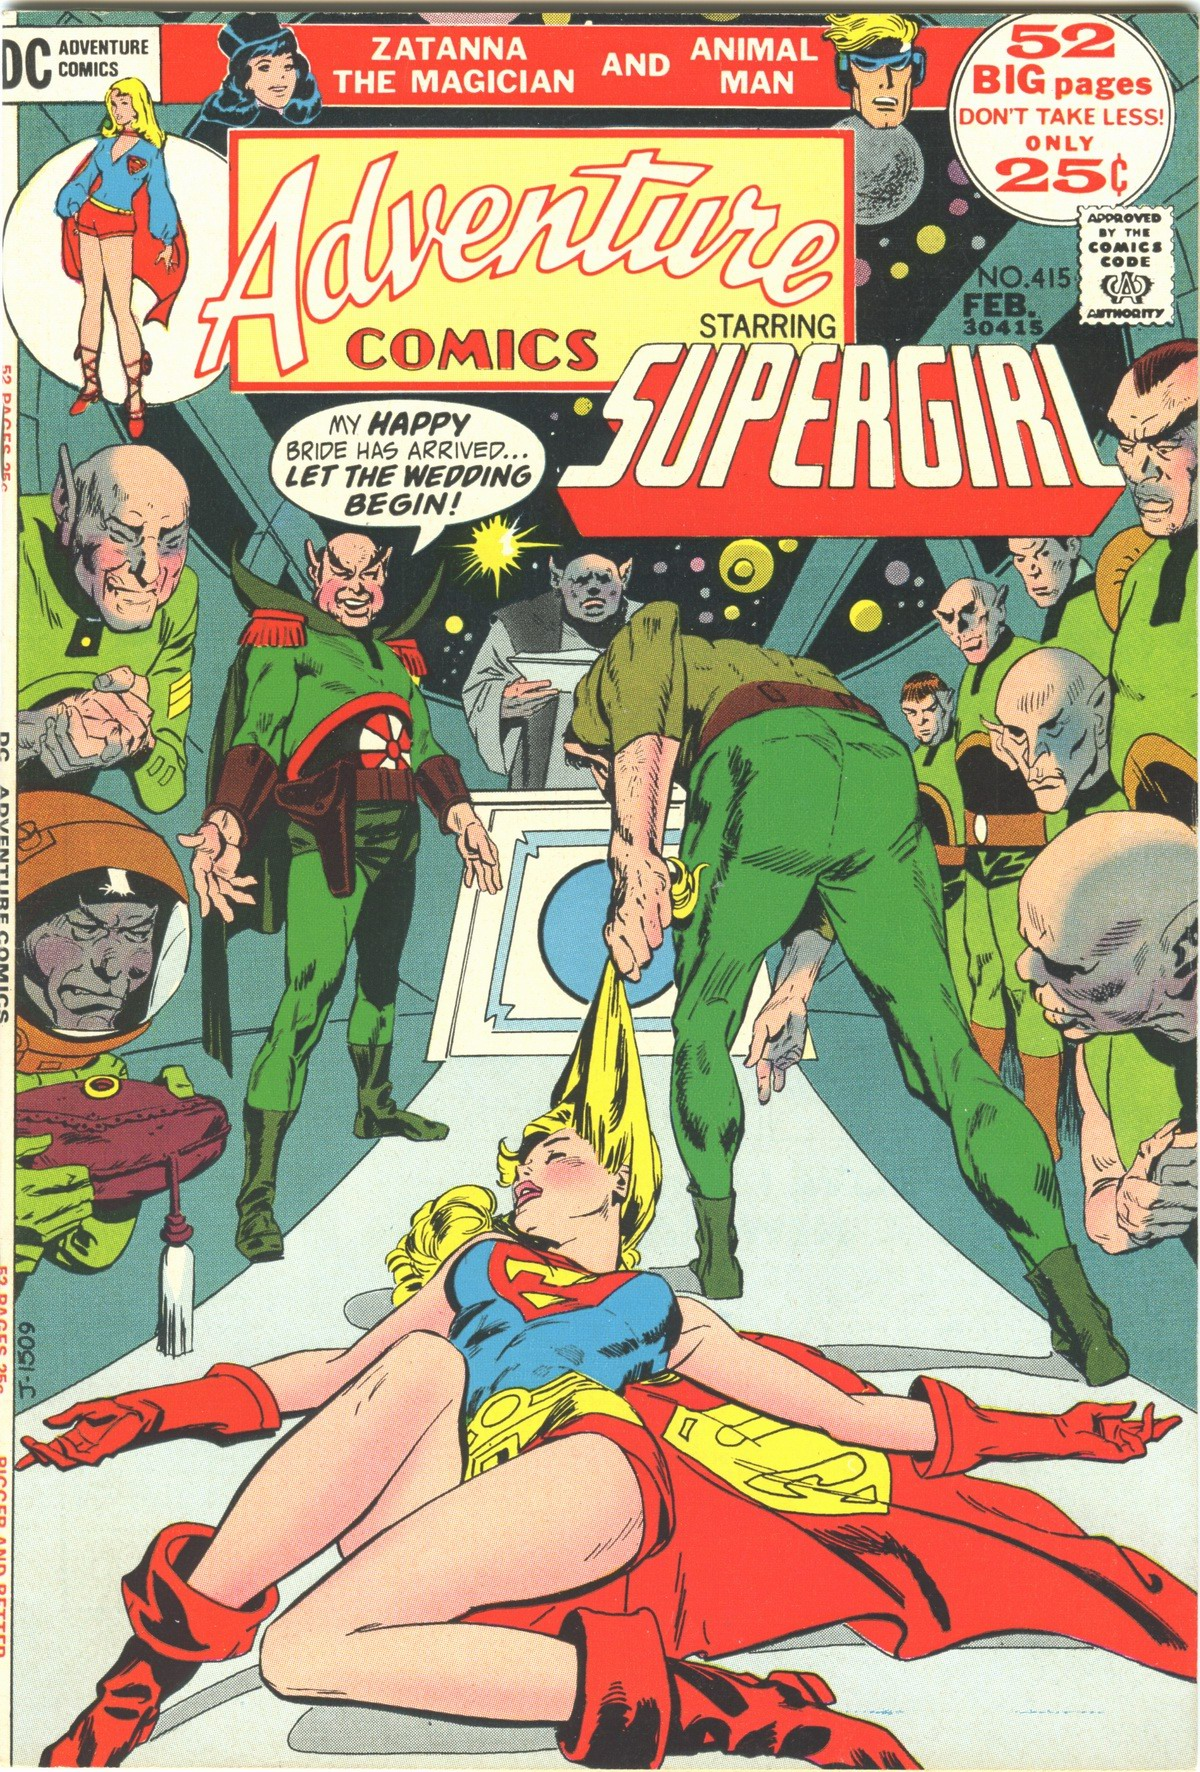 Read online Adventure Comics (1938) comic -  Issue #415 - 1